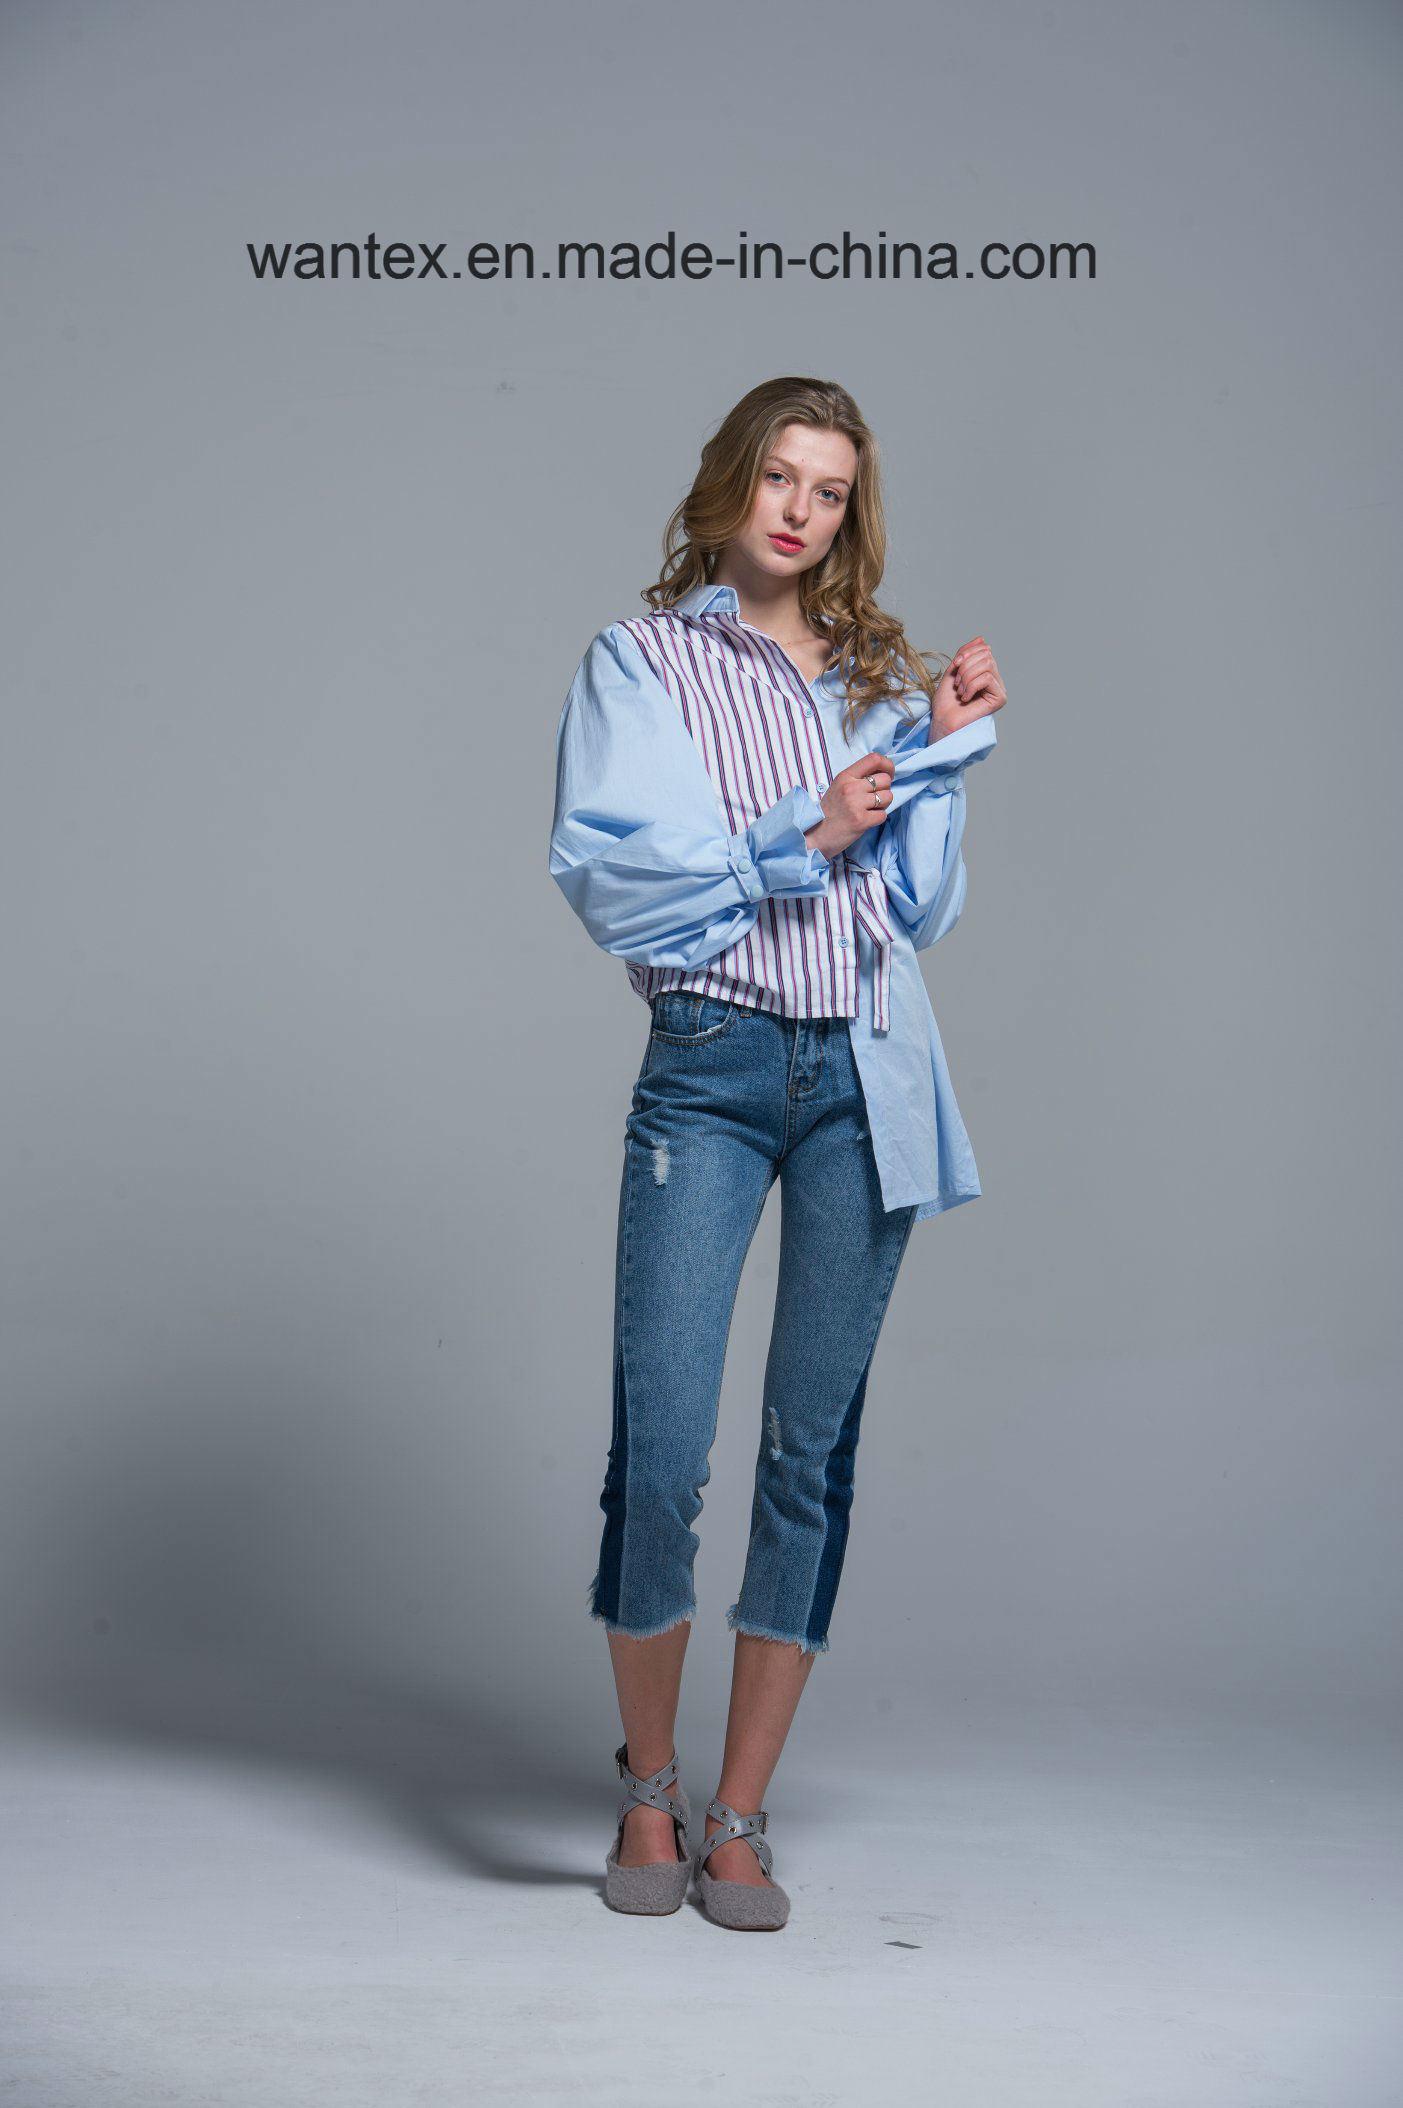 Ladies Blouse 100% Cotton Irregular Fashion Shirt Fashion Top Spring Autumn